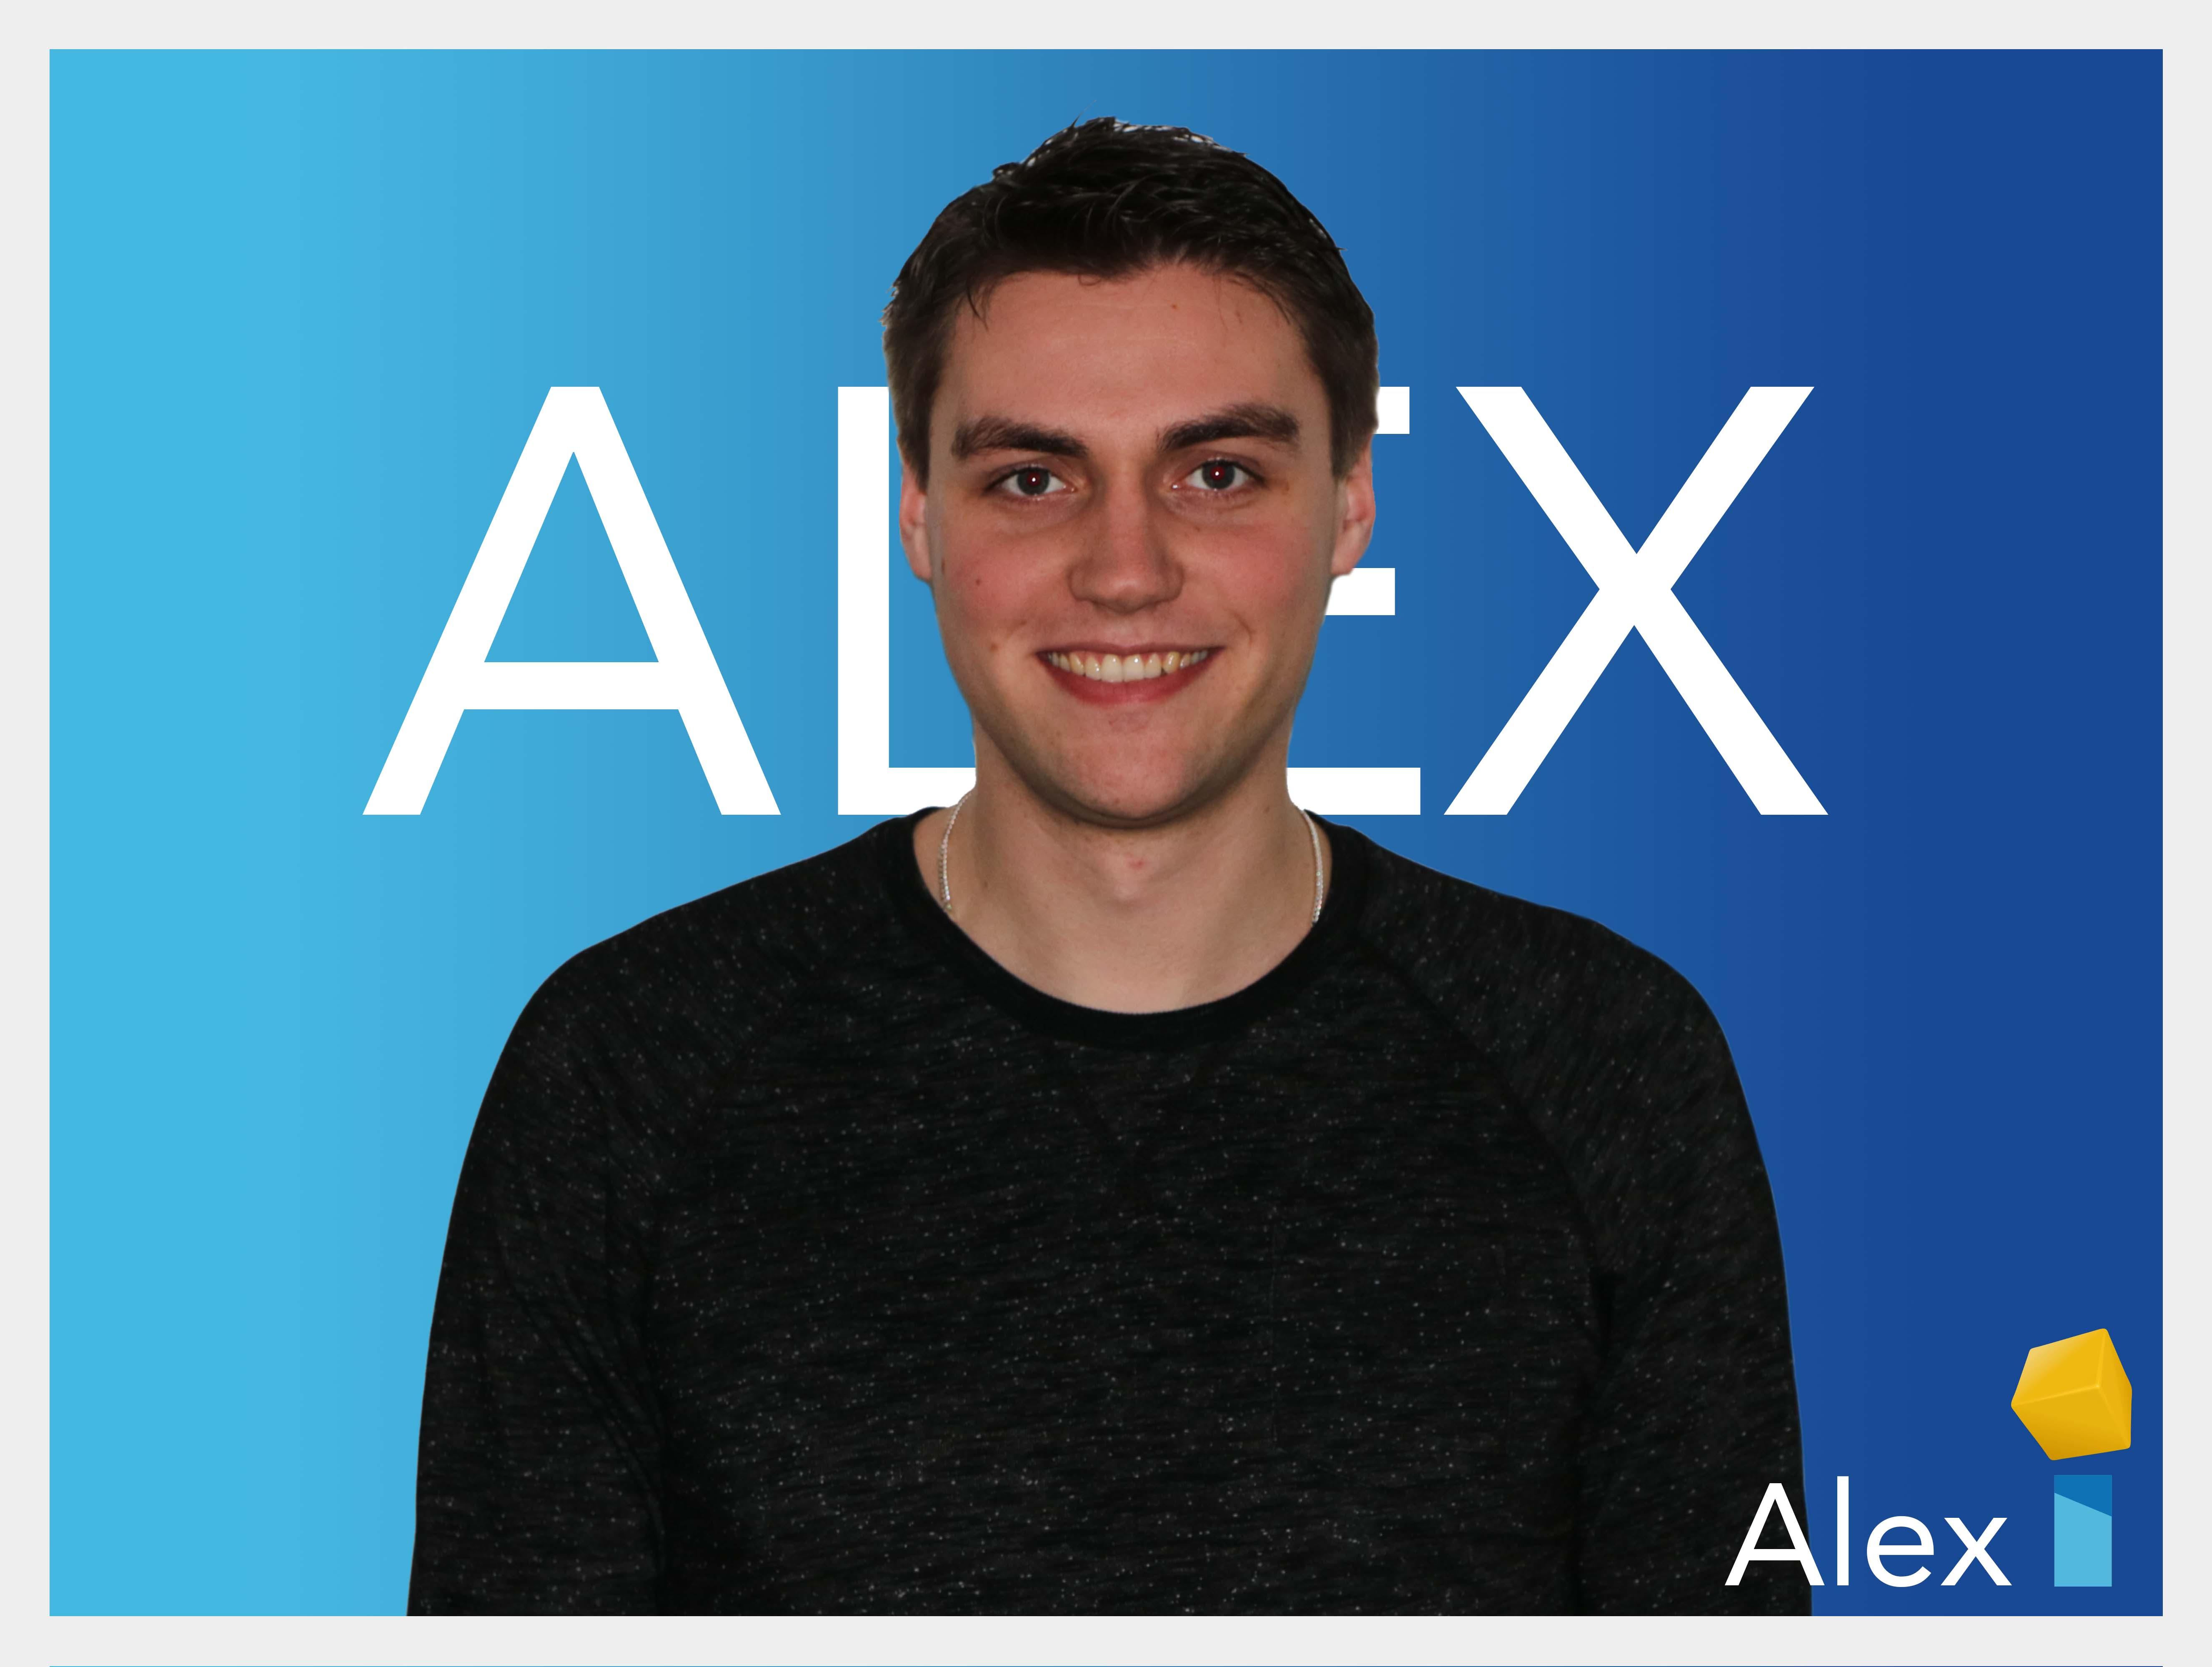 Alek Luijkx